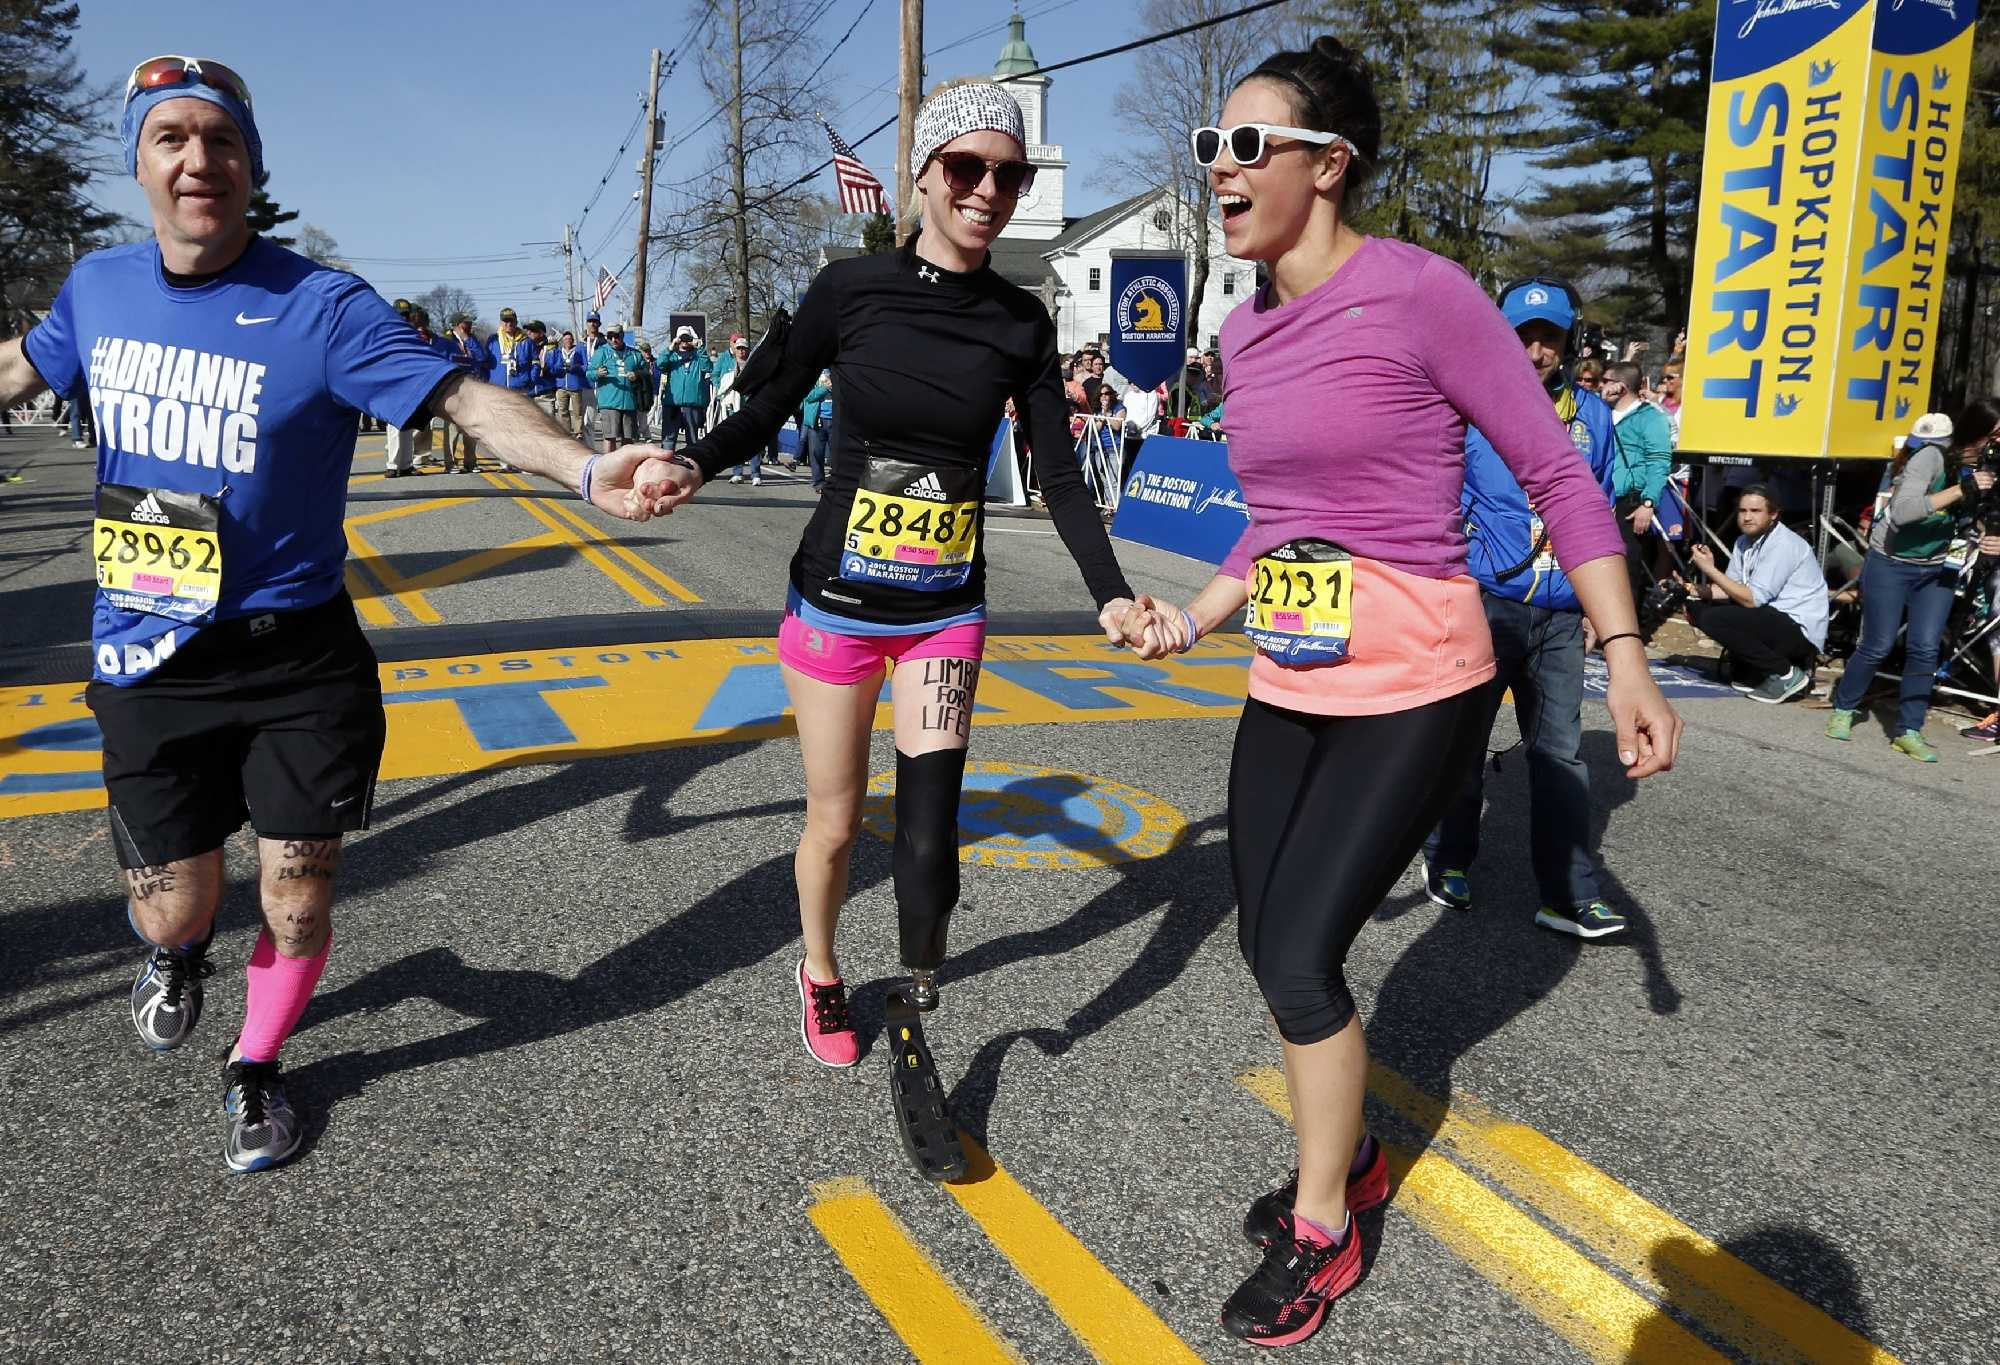 Photos: Honoring Boston Marathon bombing victims pictures